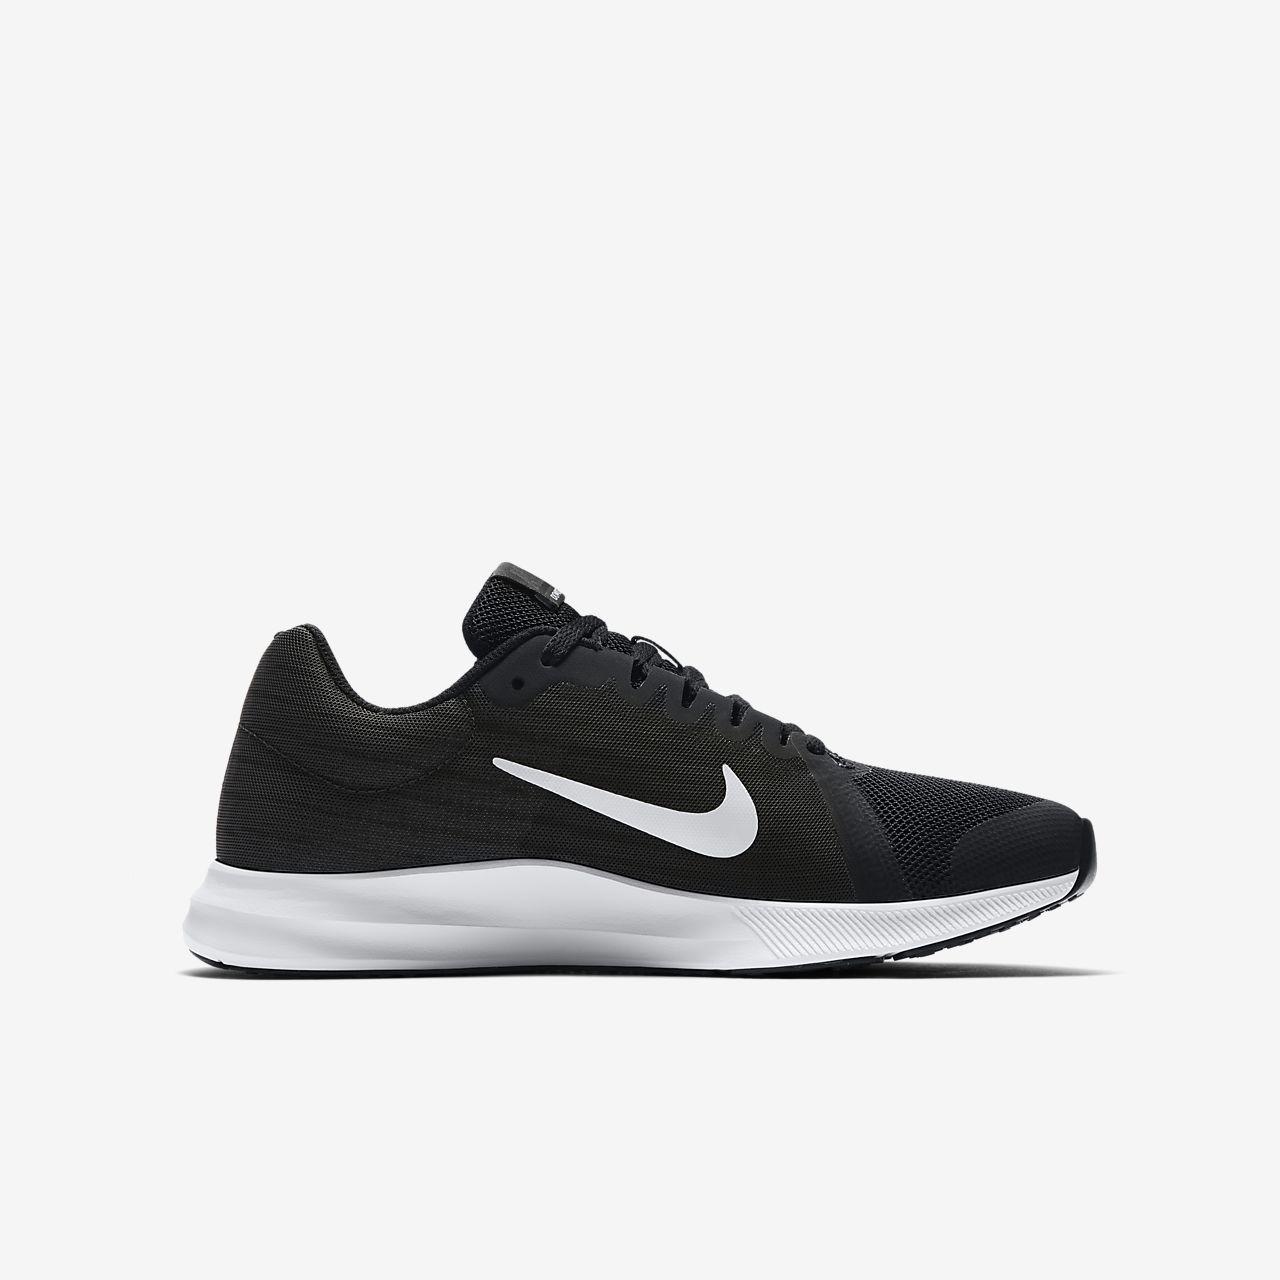 NikeDownshifter 8  LaufschuheKinder  blackwhite